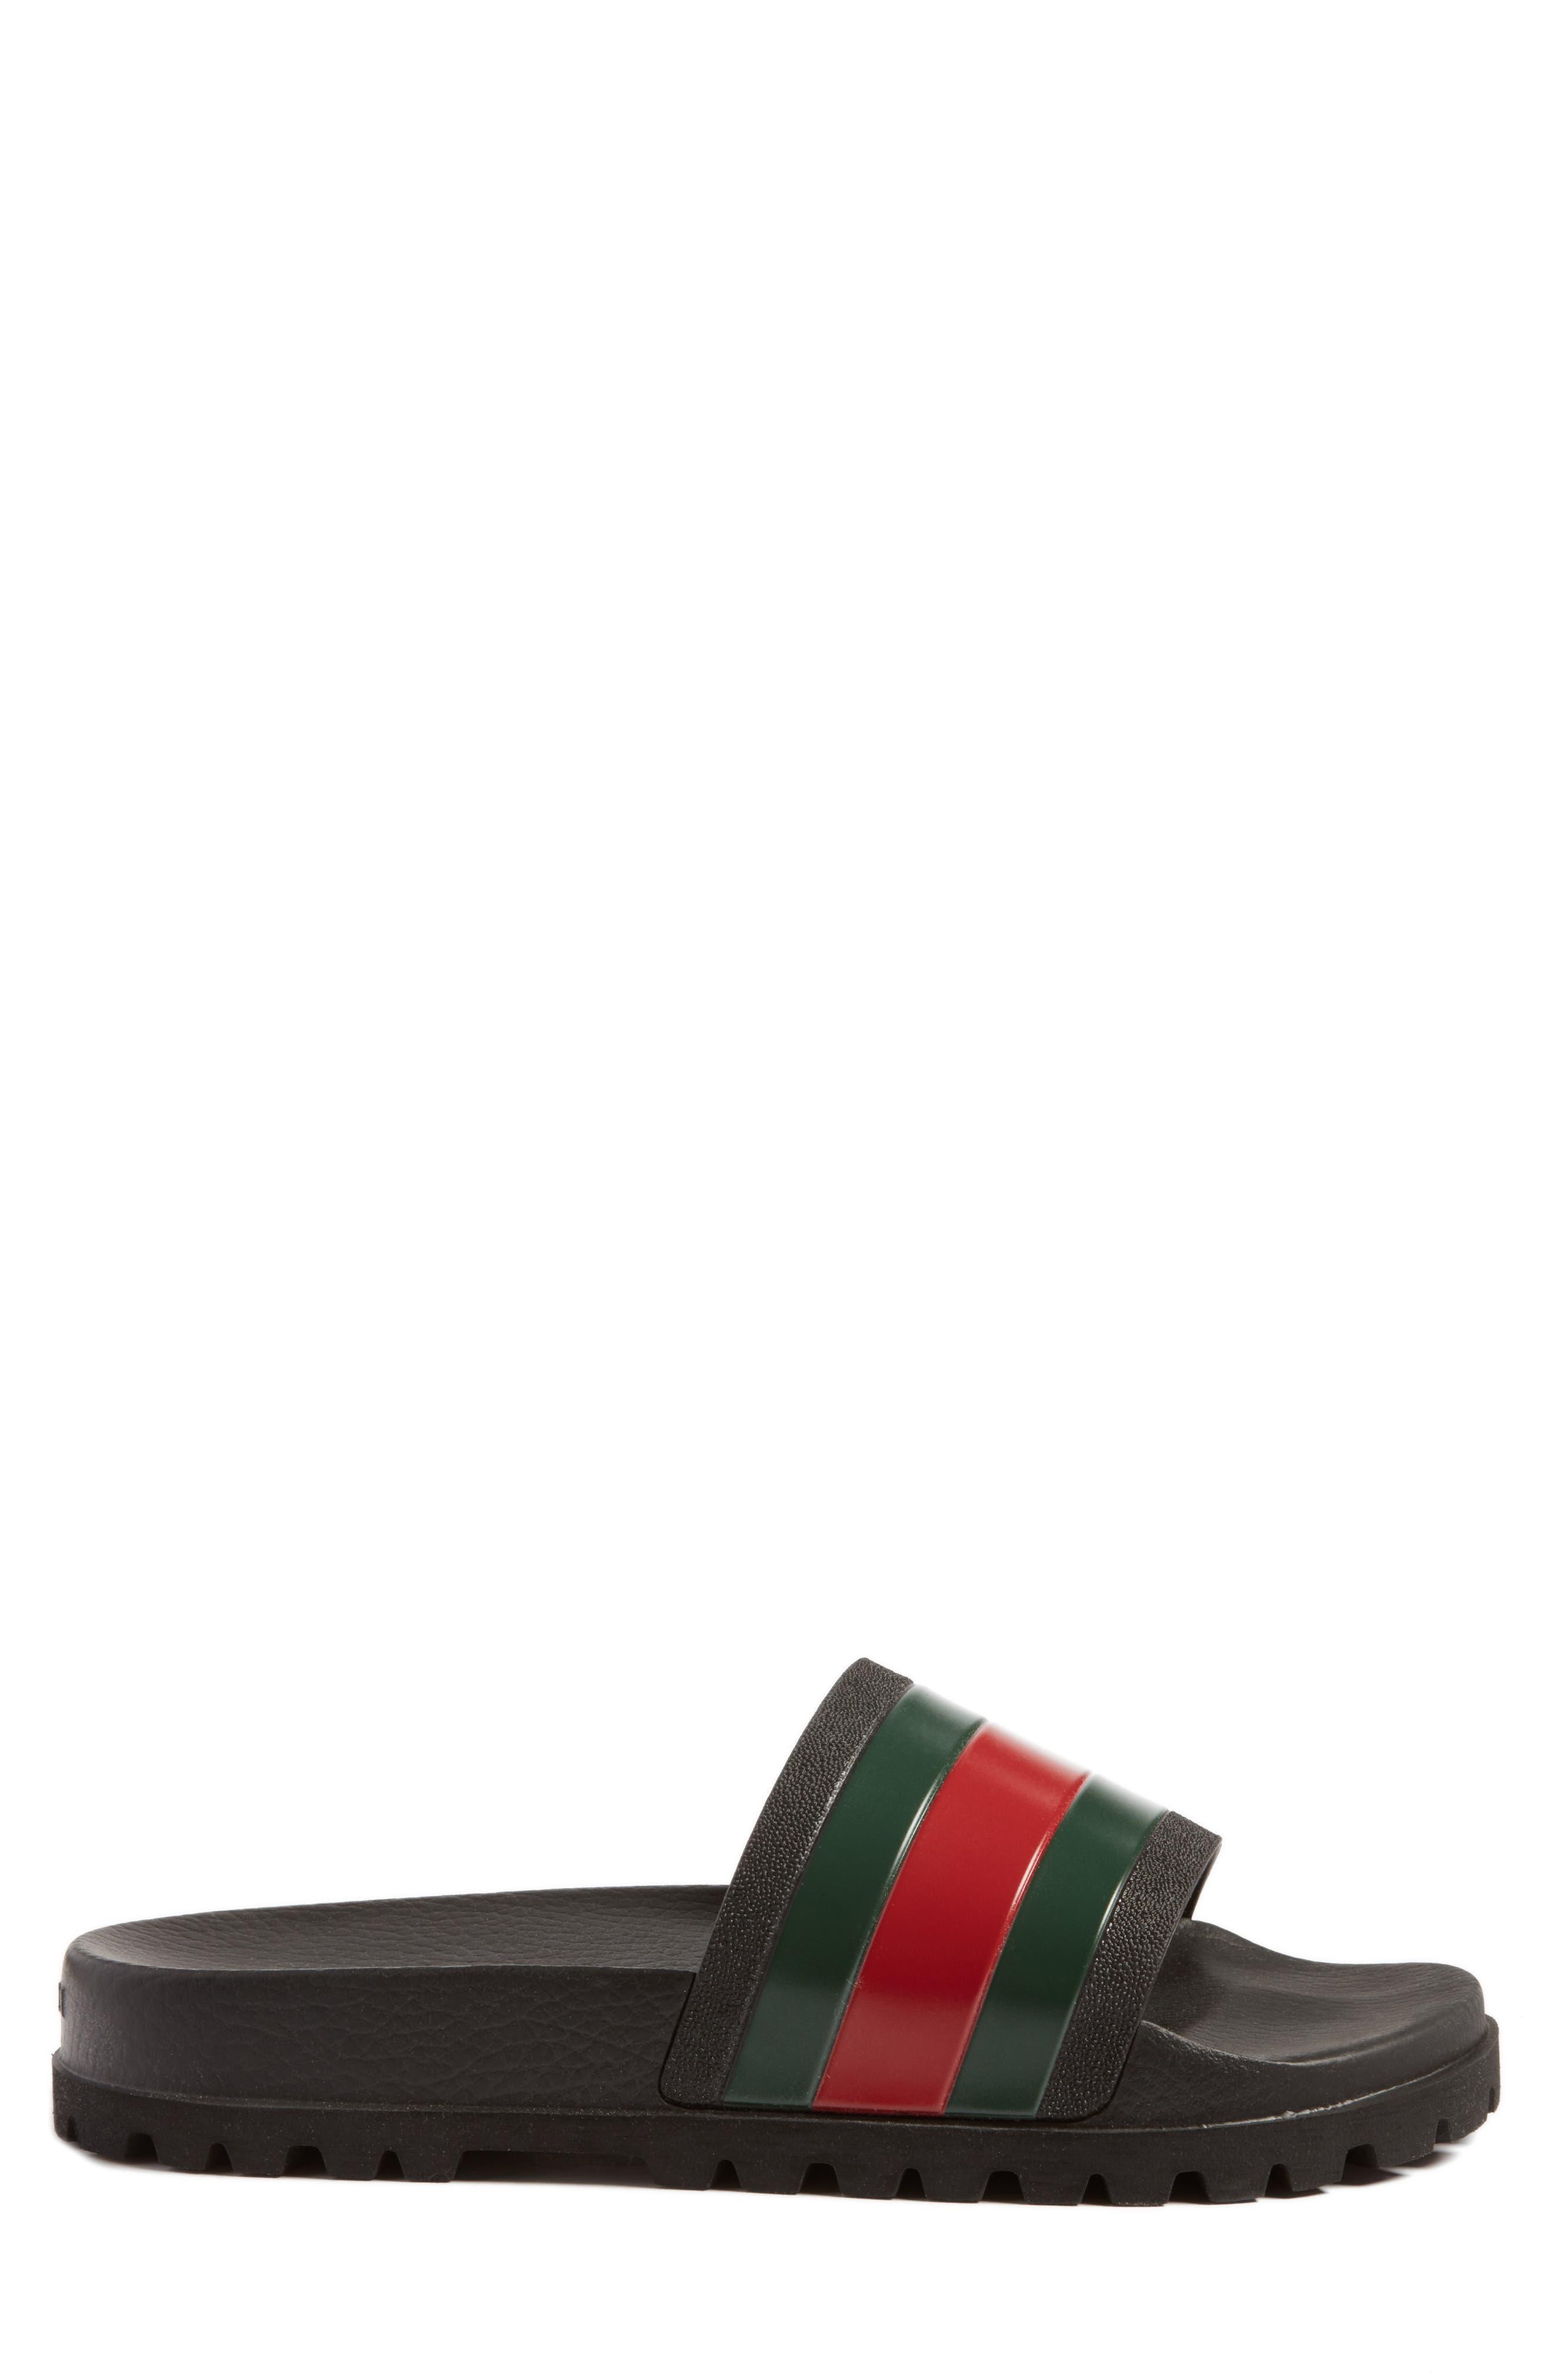 GUCCI, 'Pursuit Treck' Slide Sandal, Alternate thumbnail 3, color, NERO/NERO